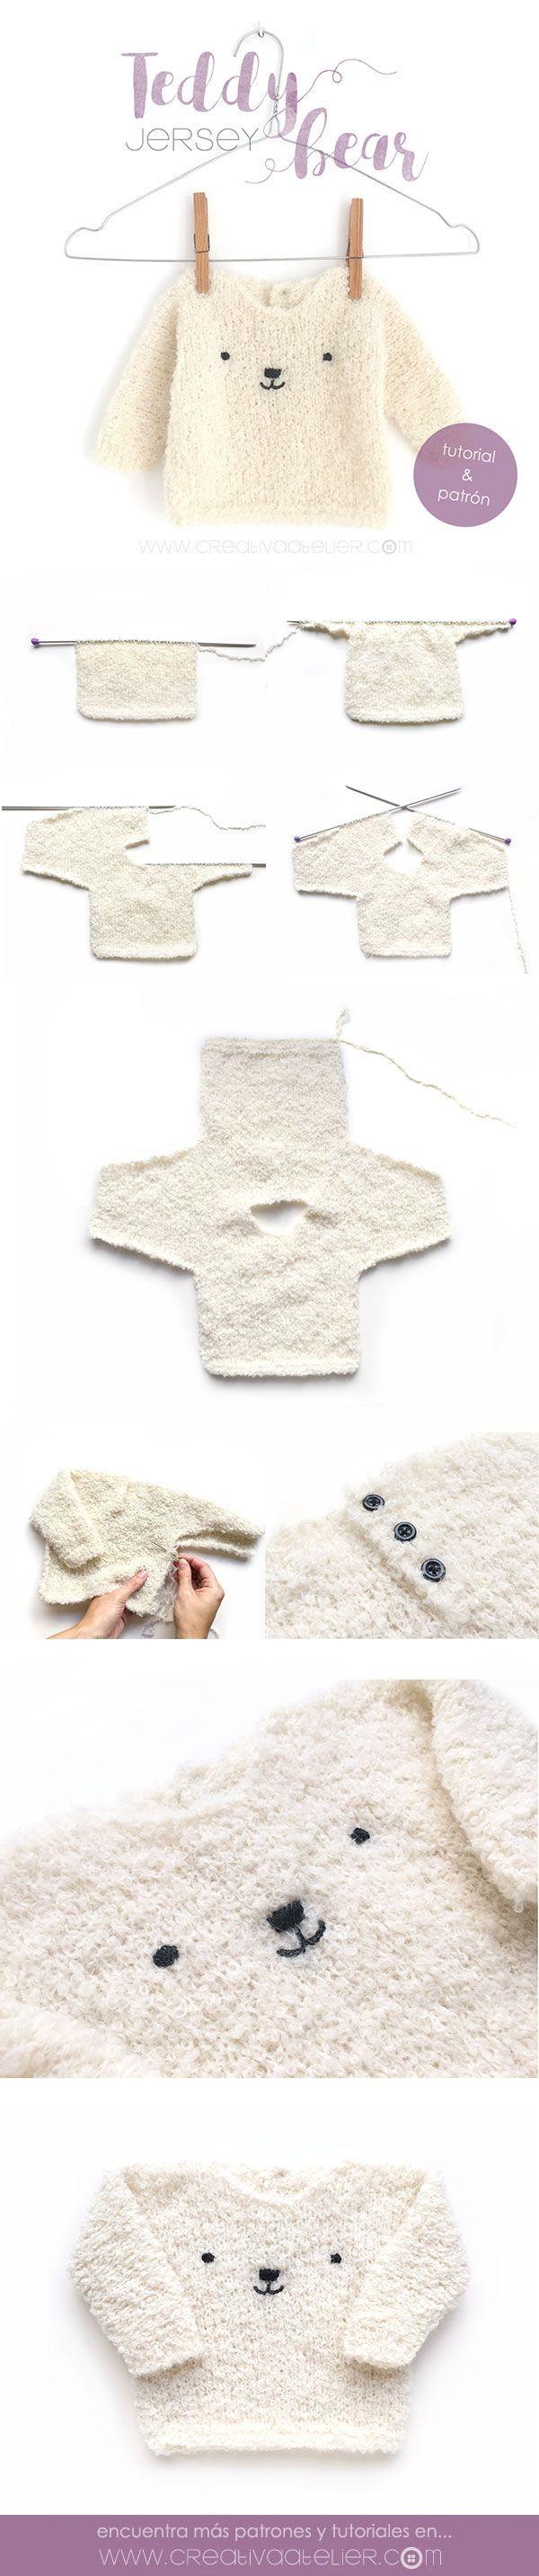 Mejores 25 imágenes de chaquetitas en Pinterest | Bebé de ganchillo ...